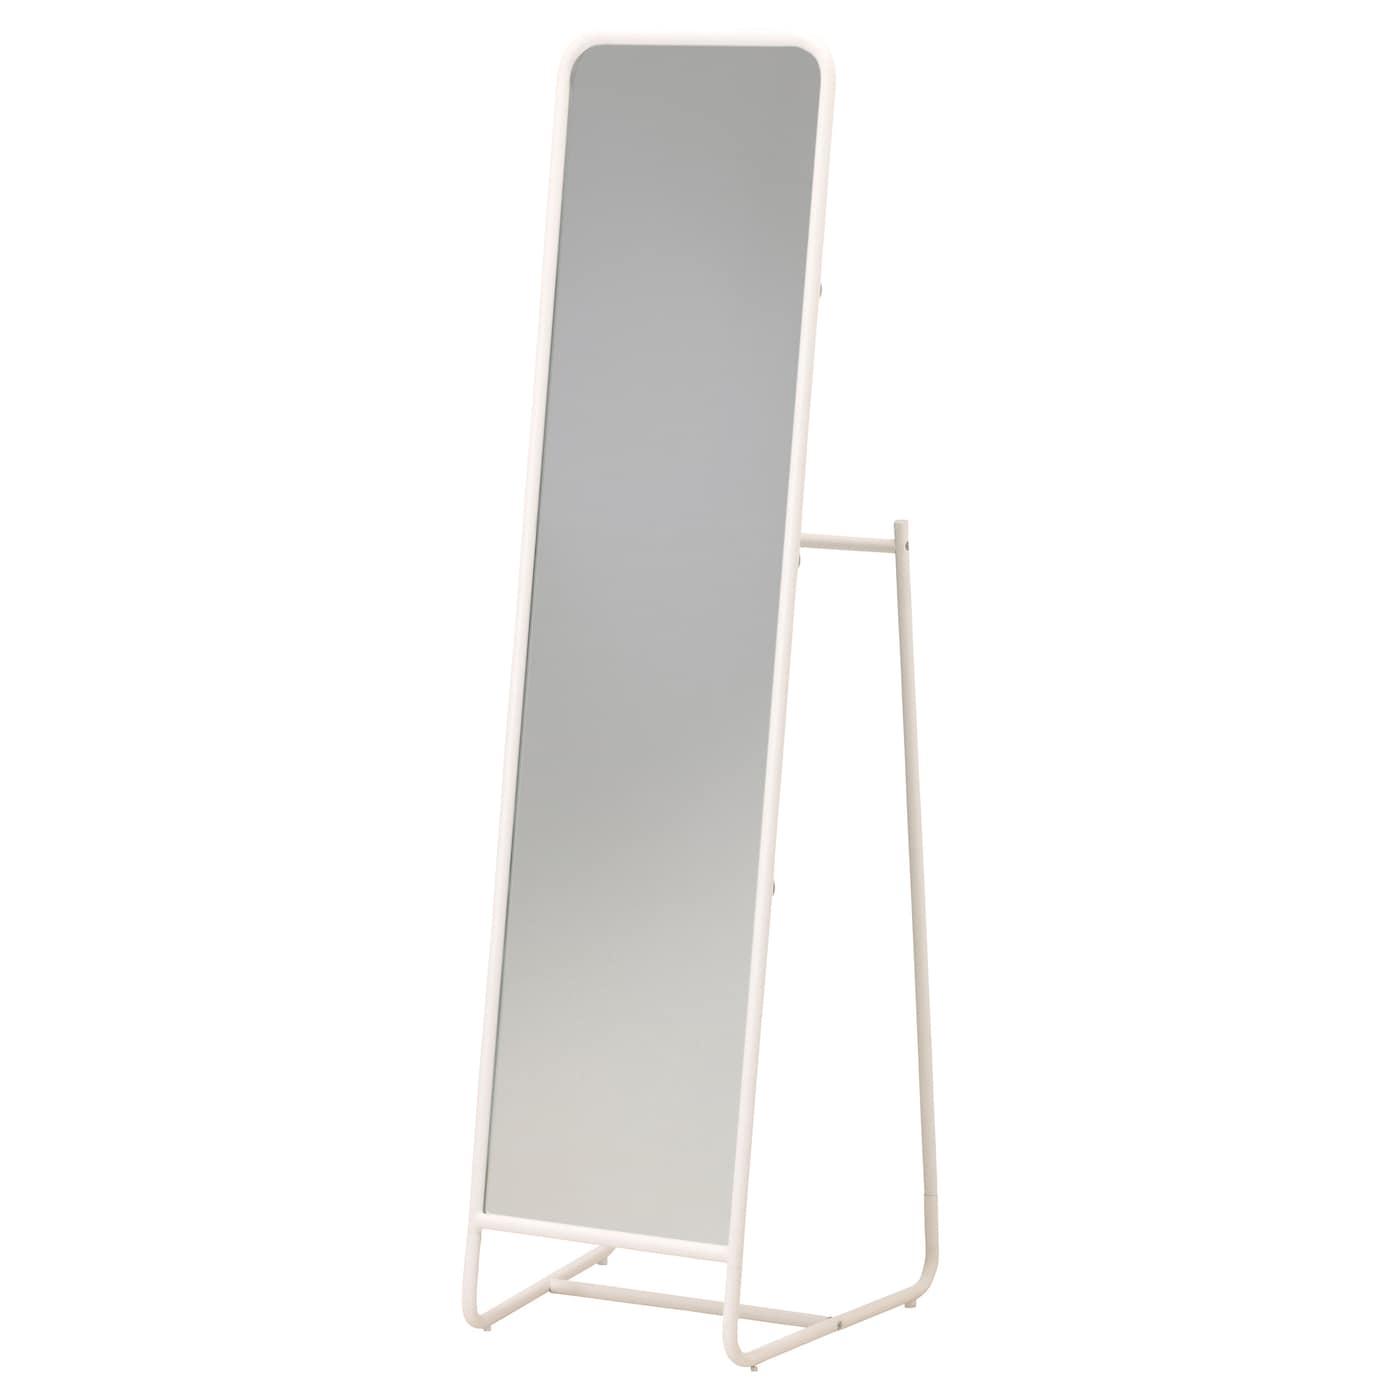 Mirrors ikea ireland dublin for Standing glass mirror